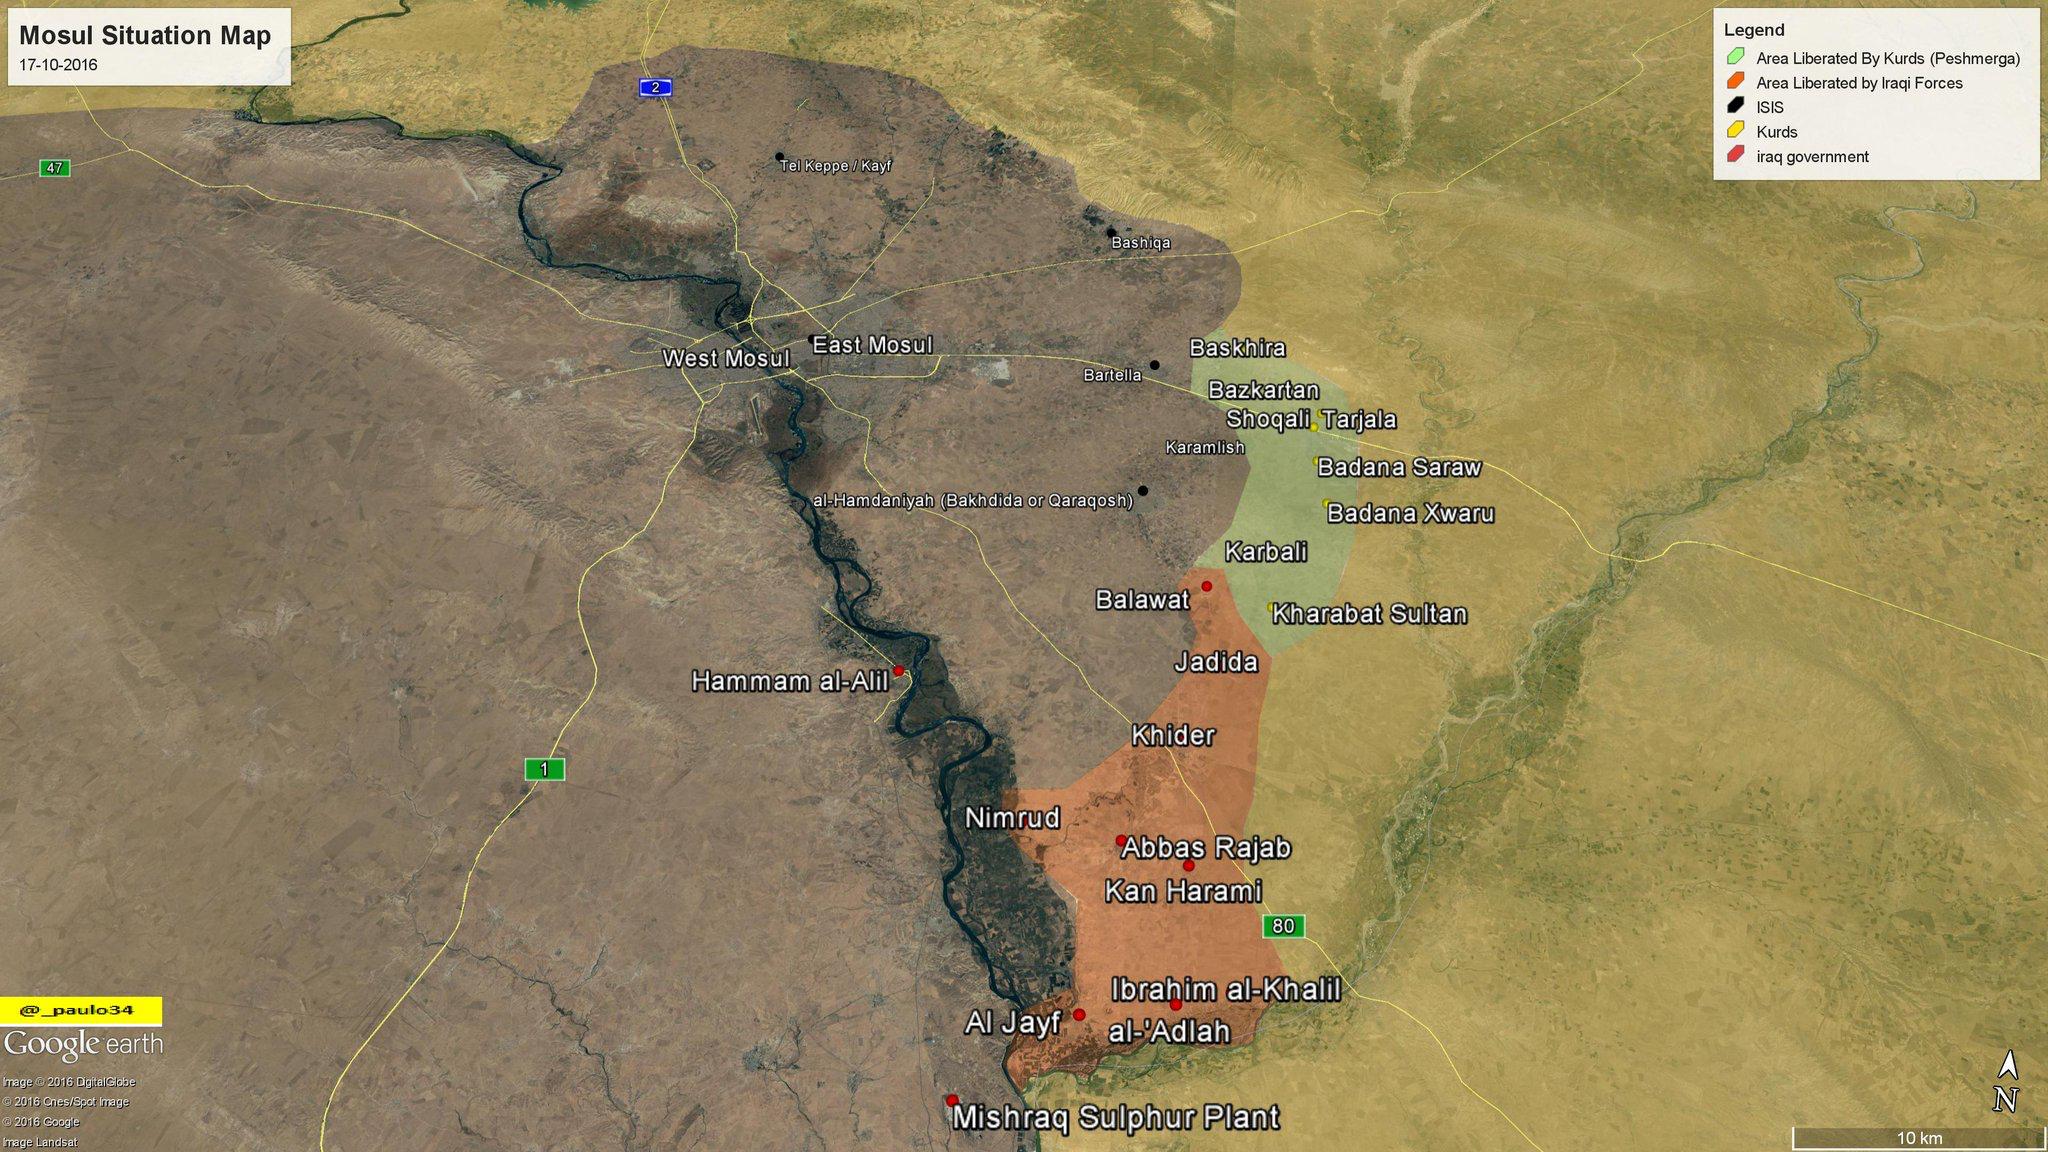 Mosul Situation Map 17 10 2016 Iraq Peshmerga ISF